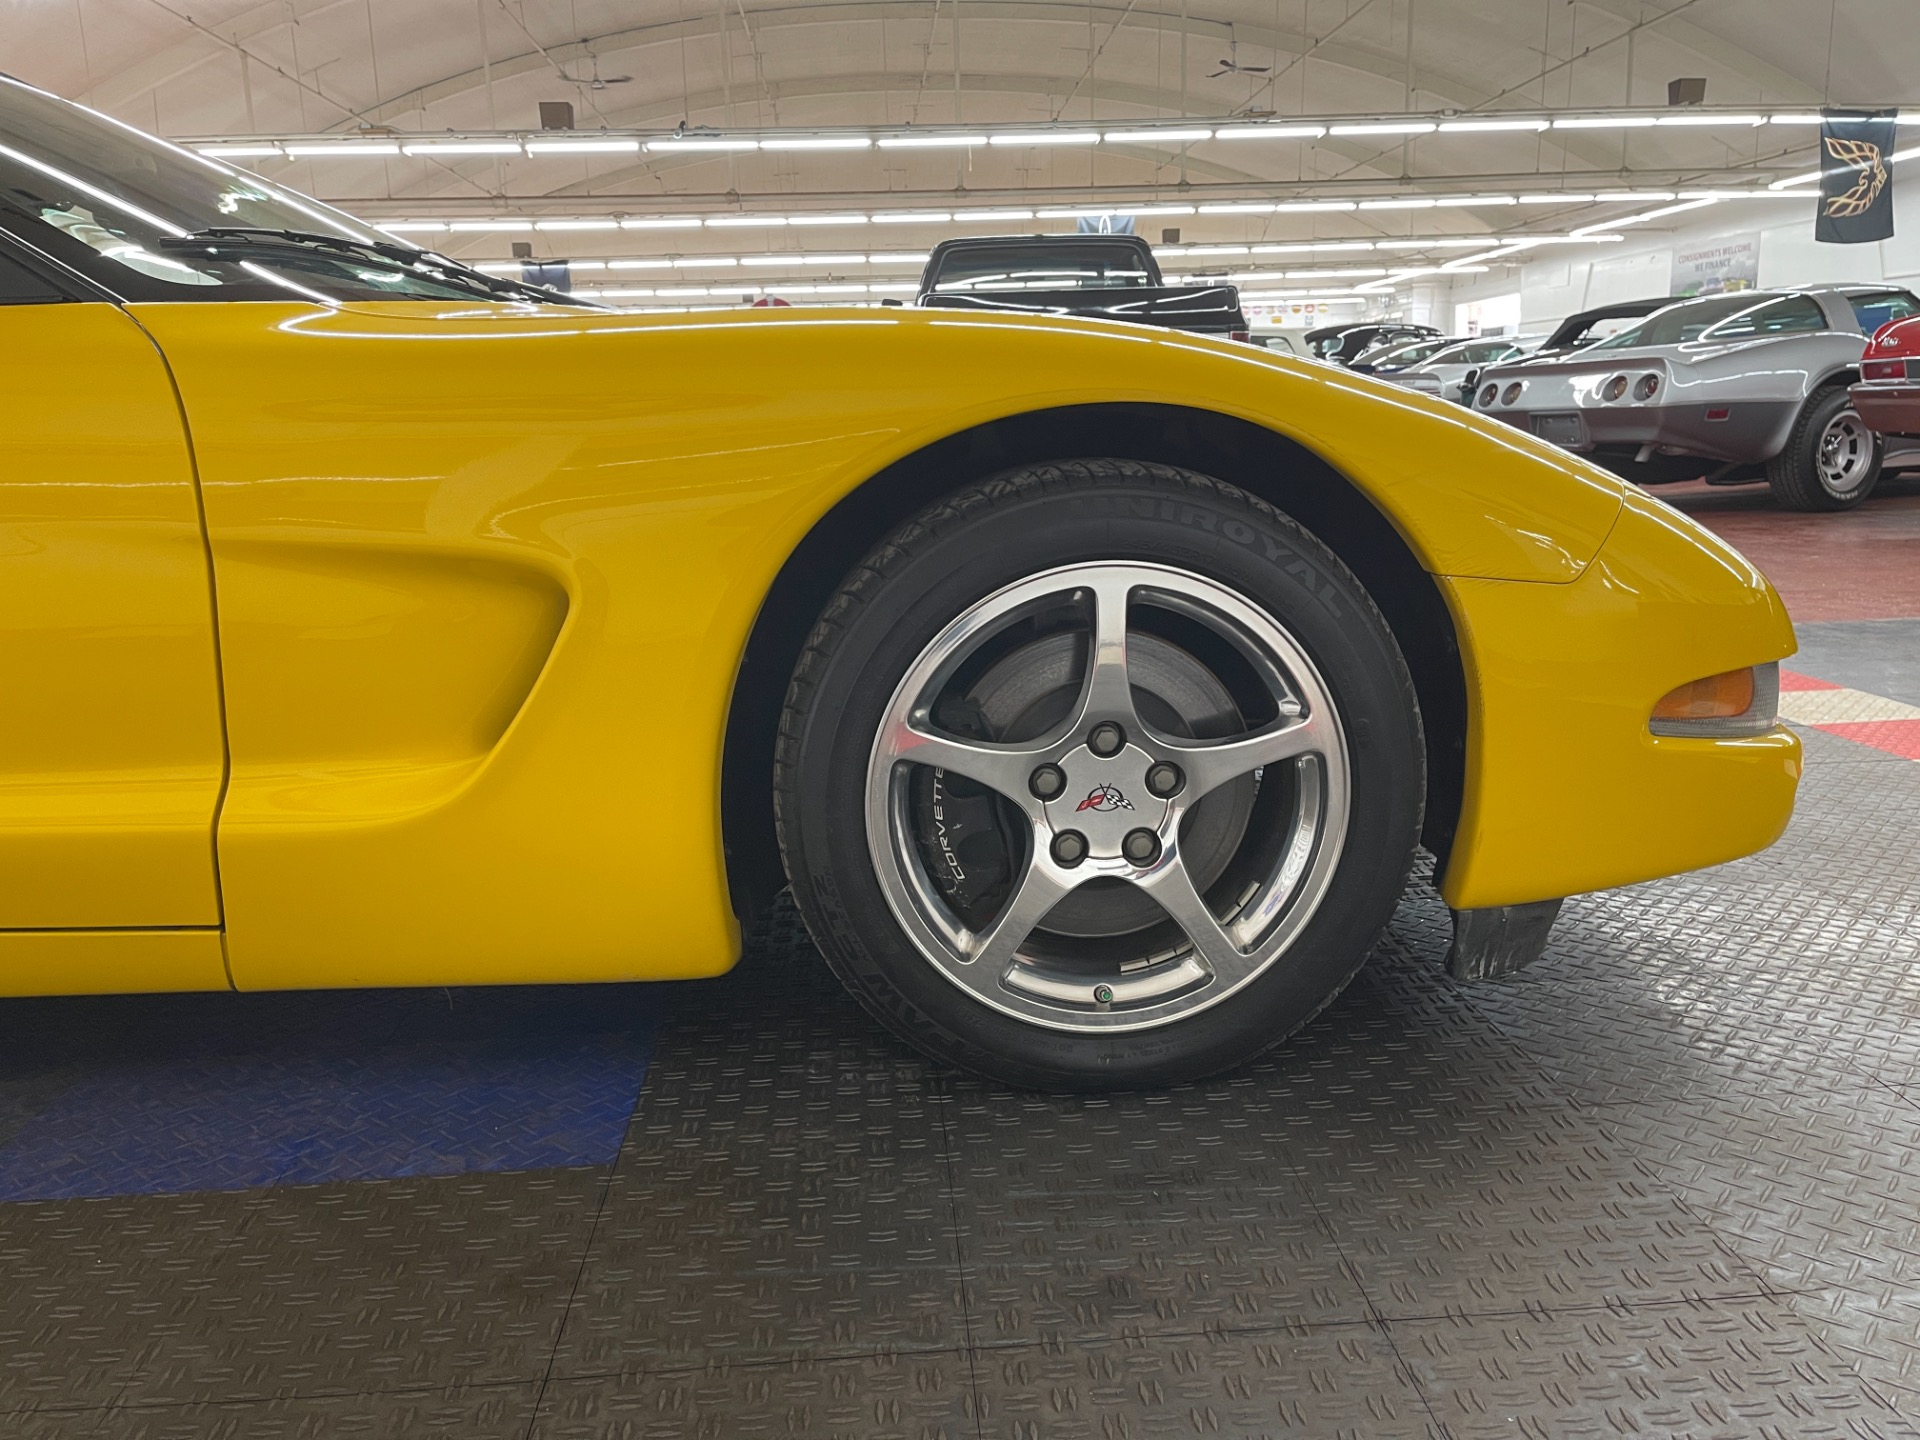 Used 2003 Chevrolet Corvette Convertible - SEE VIDEO - | Mundelein, IL